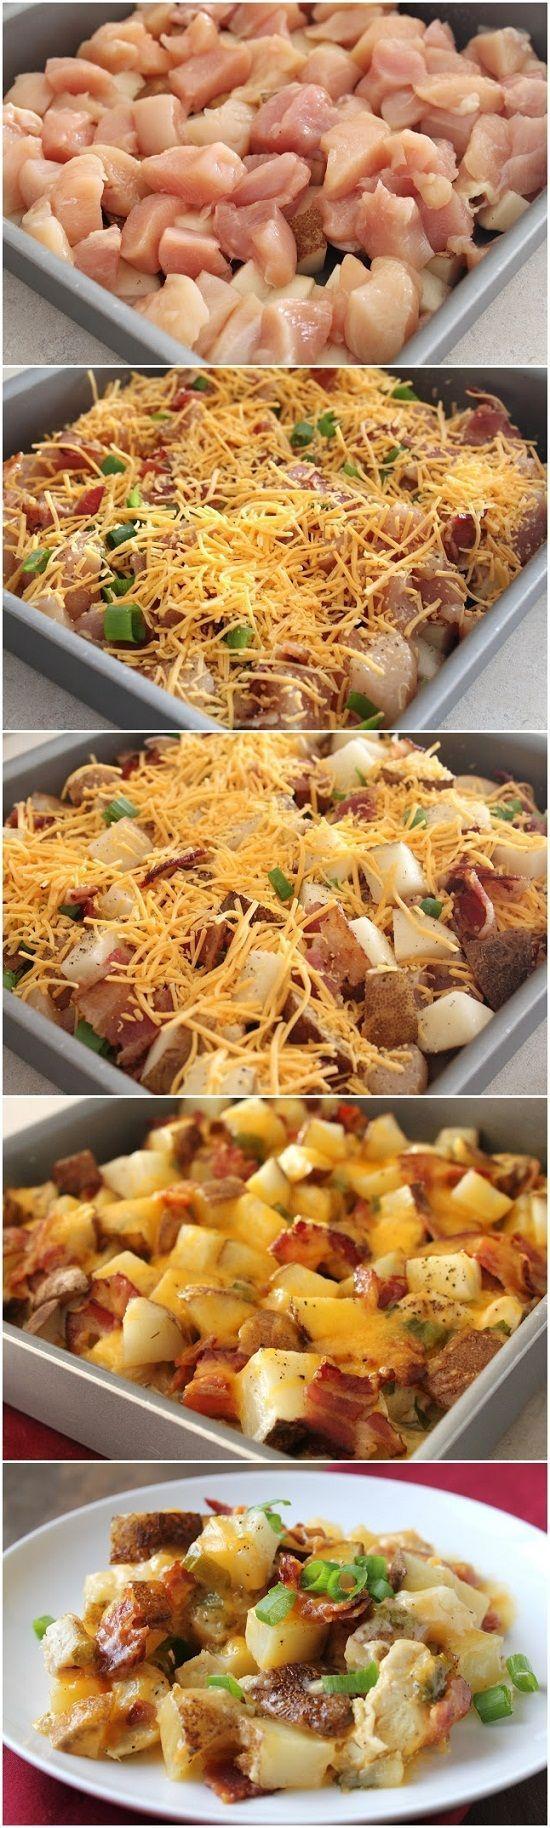 ... Casserole Recipe | Loaded Baked Potatoes, Baked Potatoes and Potatoes